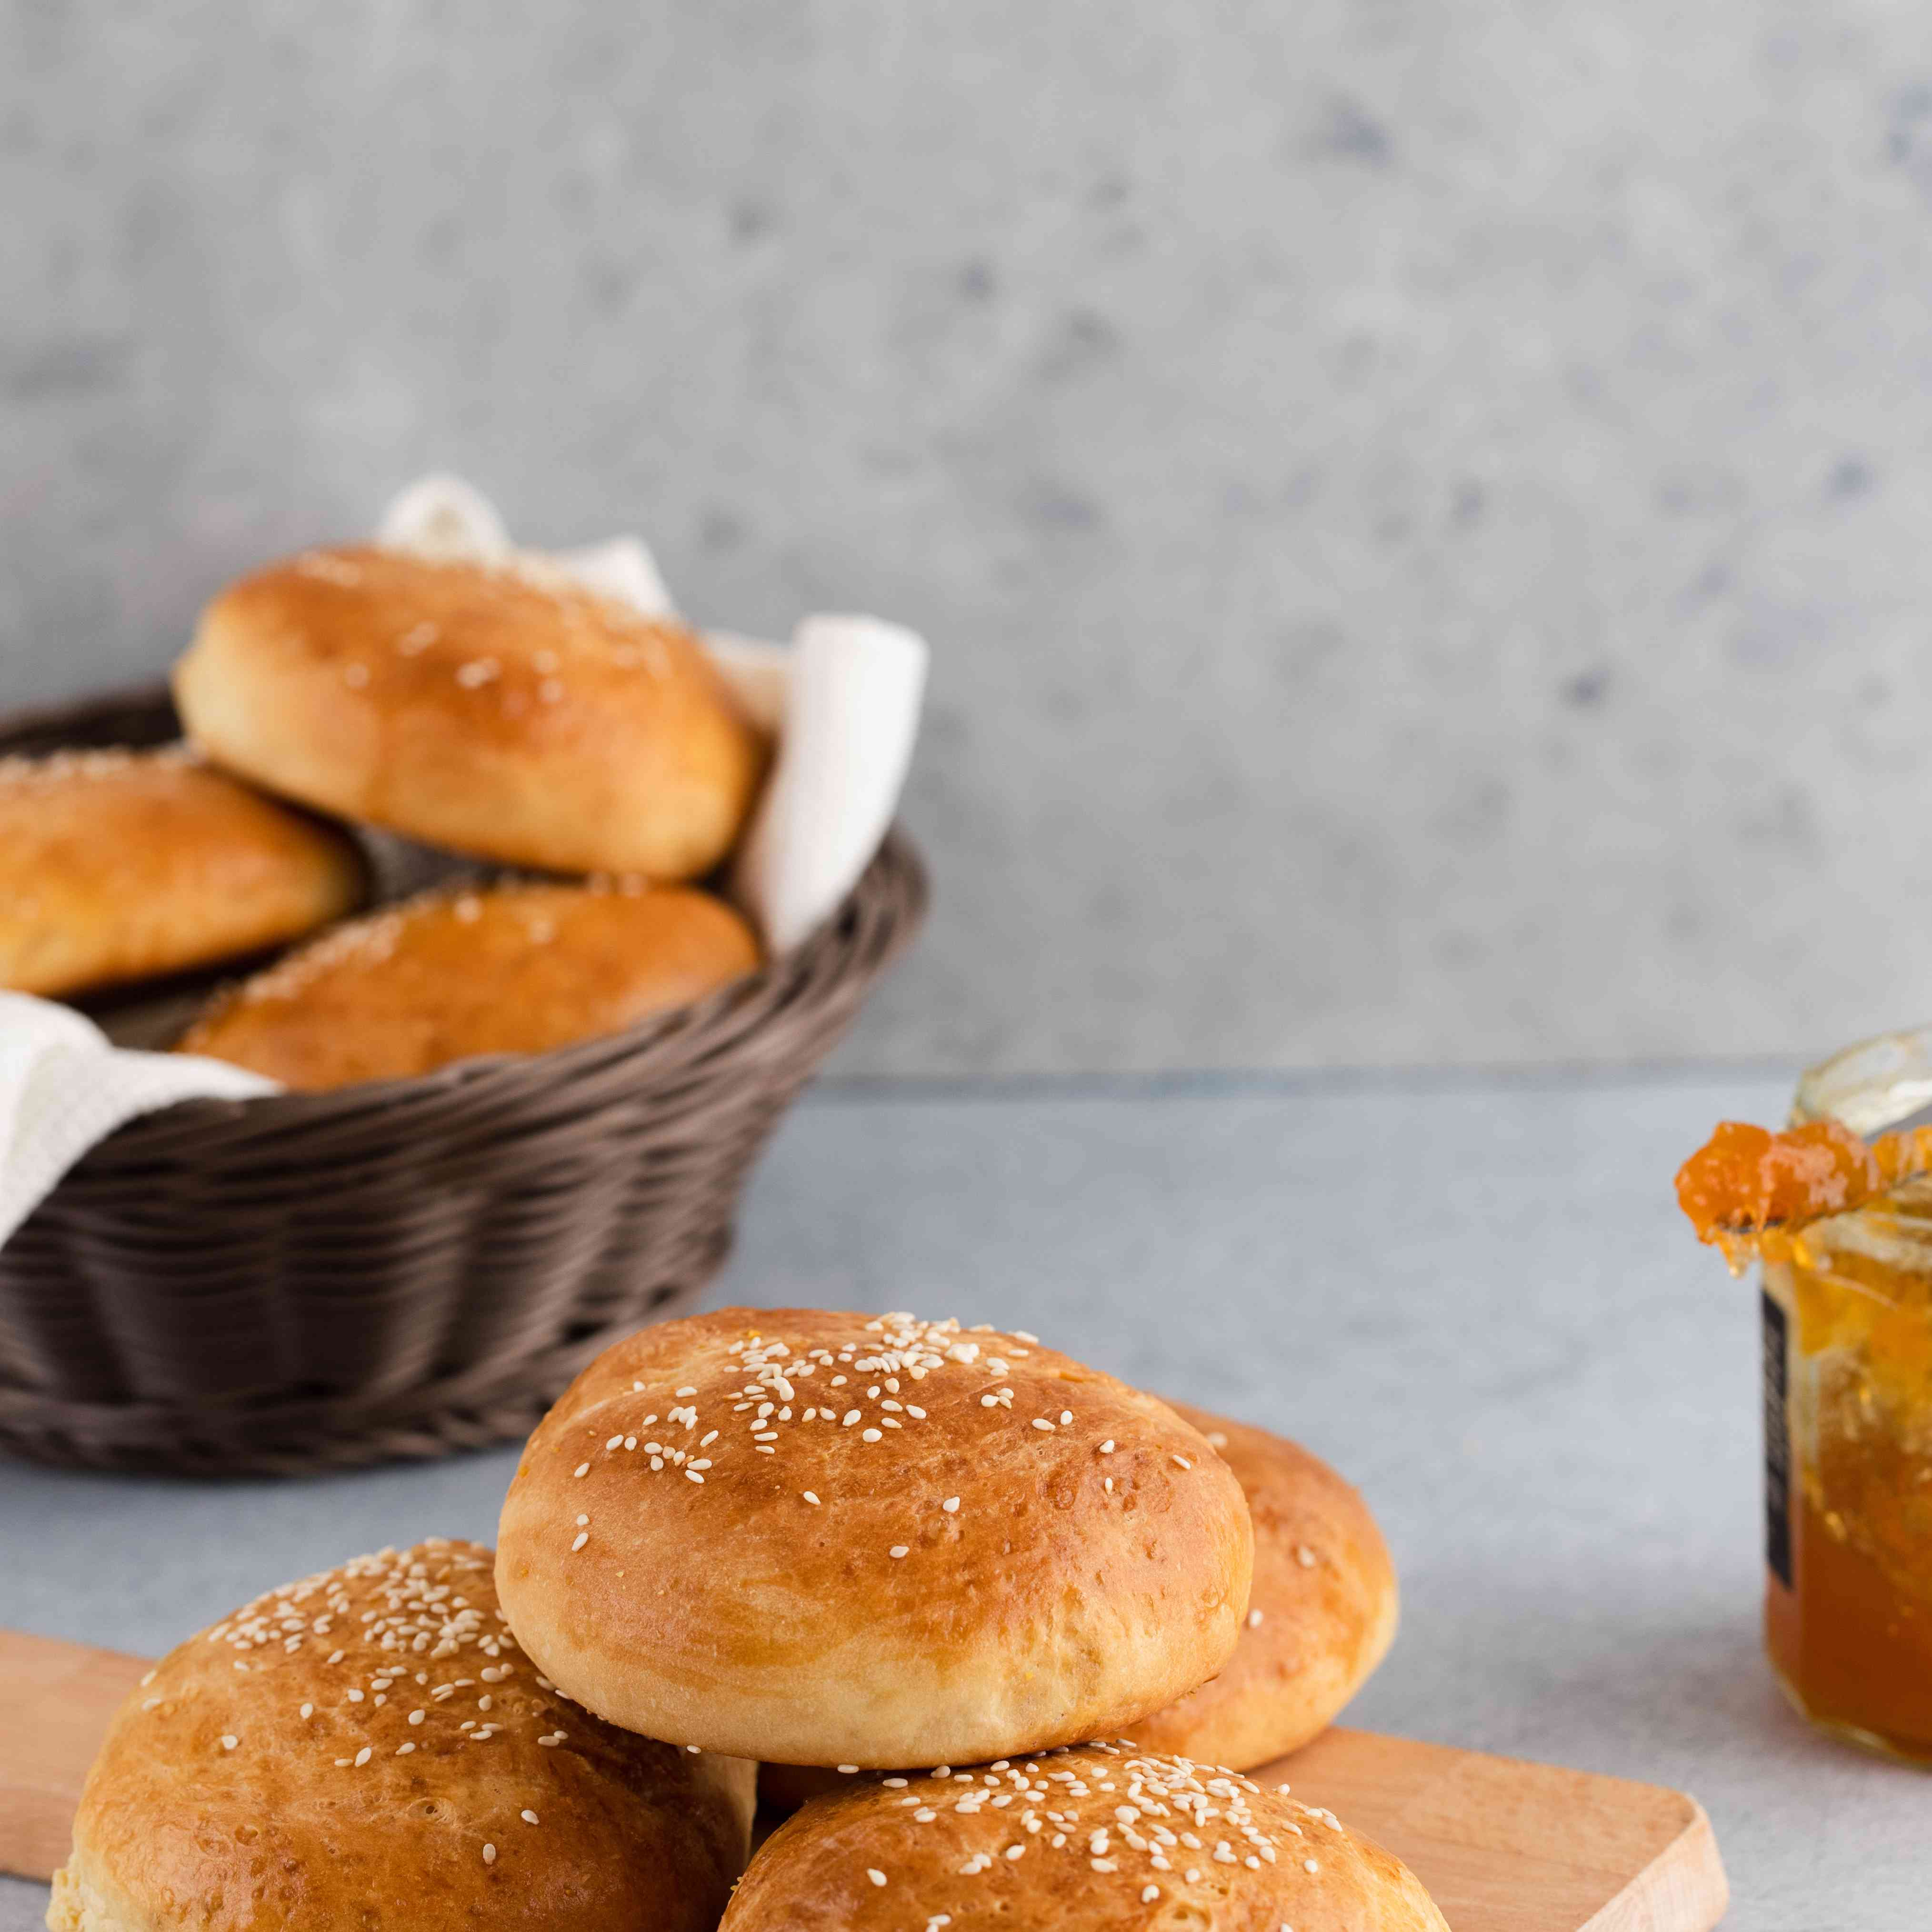 Rich homemade brioche buns on a cutting board